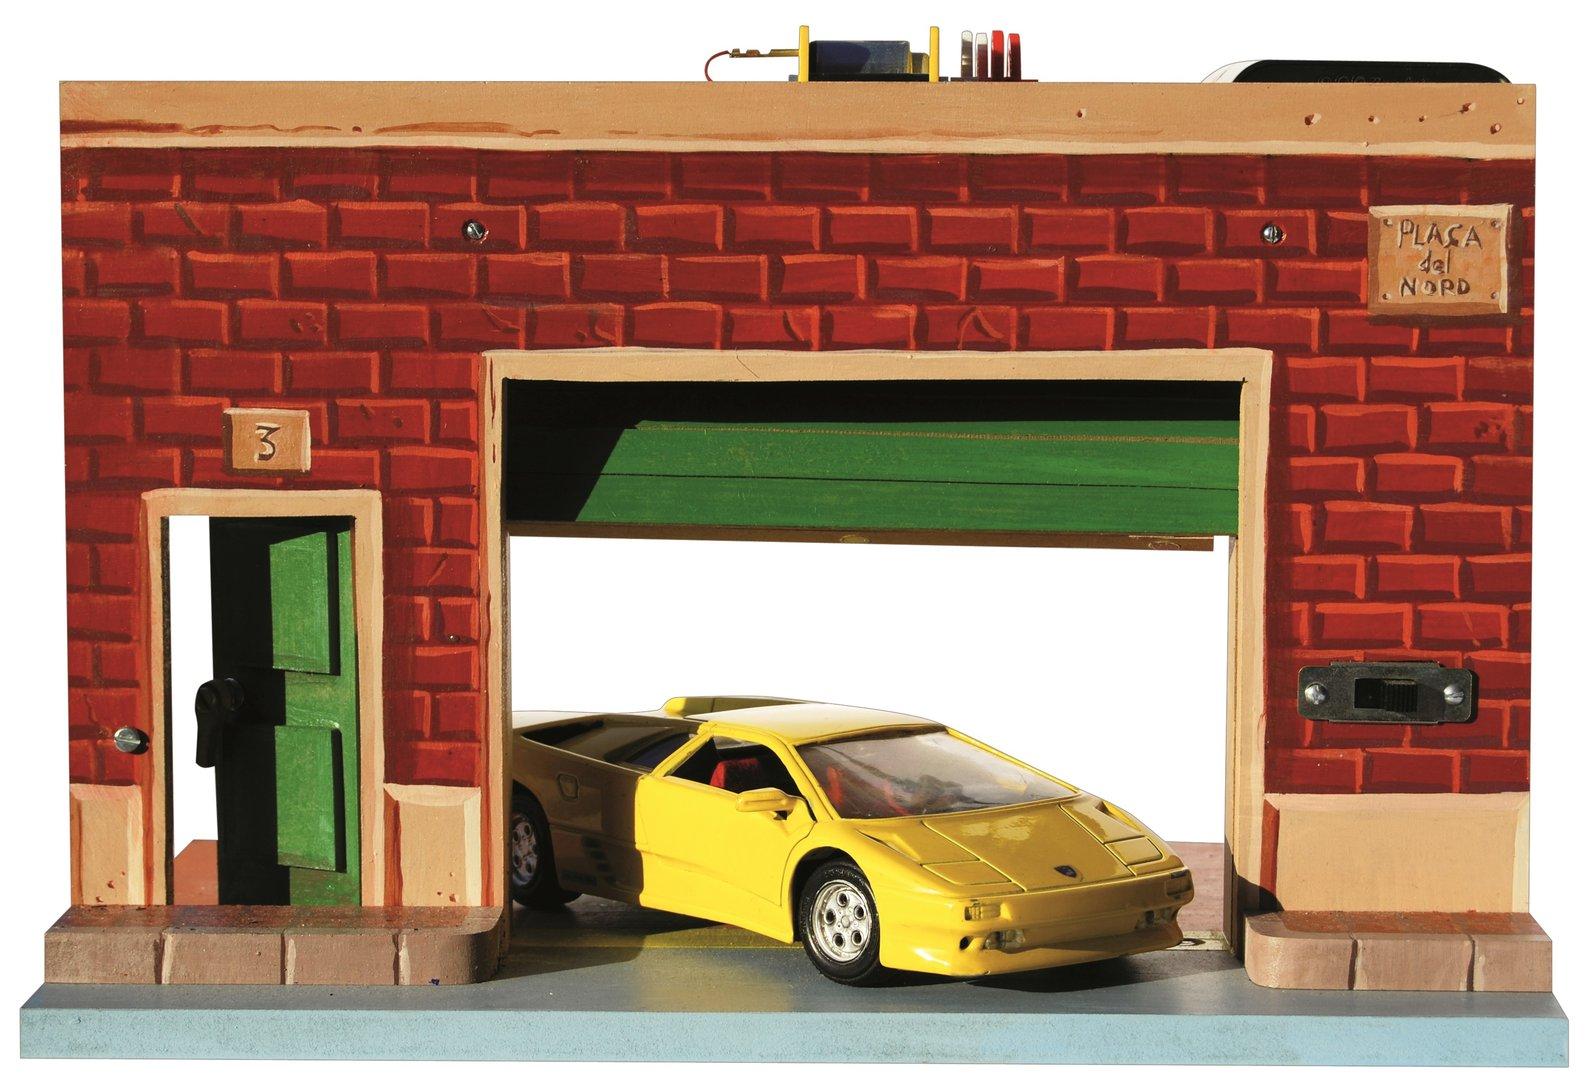 Puerta de garaje tradid traditecno for Puerta garaje